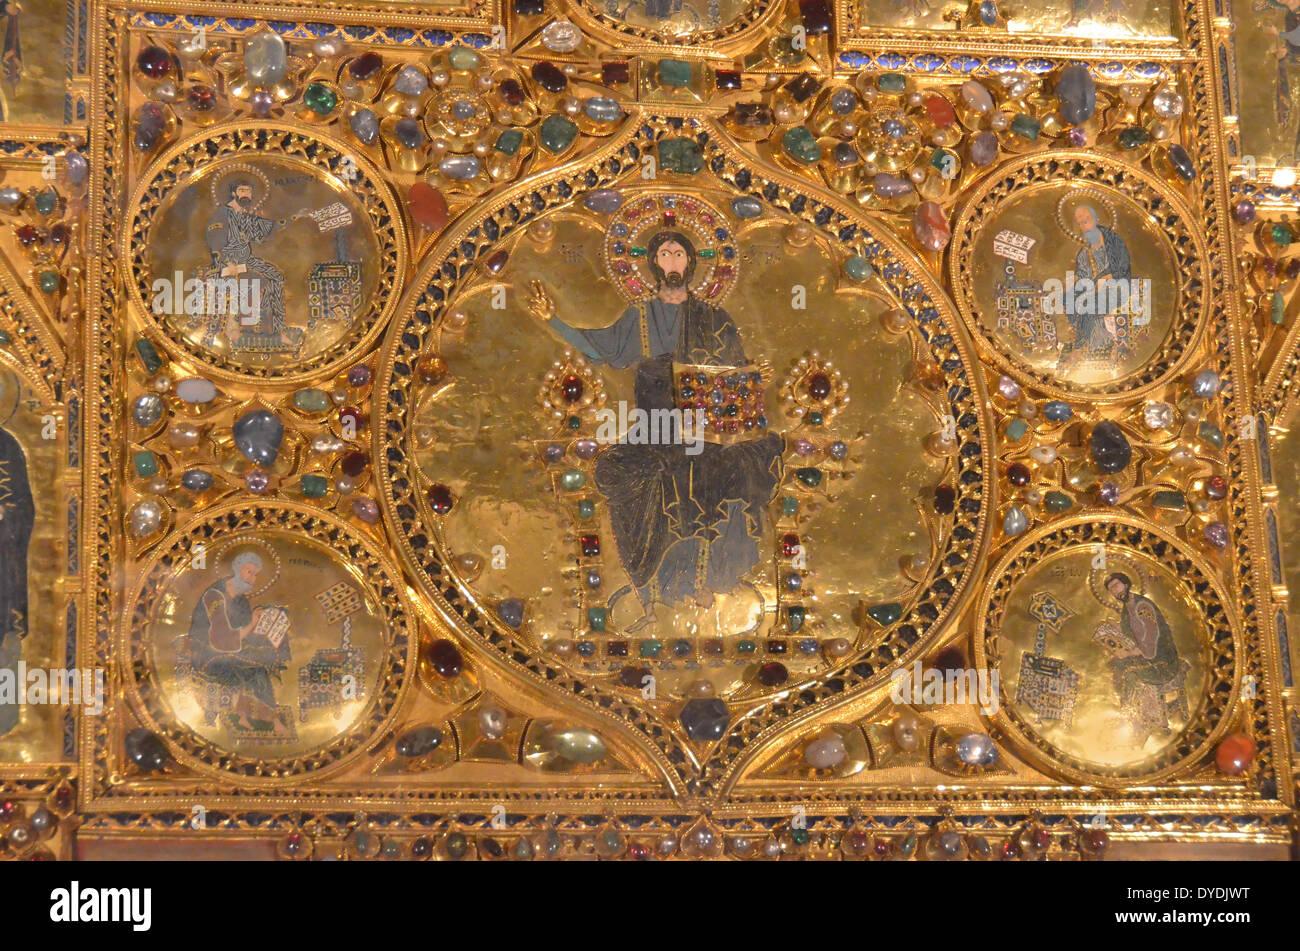 treasure gold gems priceless pala d'oro art retable pala d'oro precious stones st mark's basilica Venice Italy pure gold bul - Stock Image